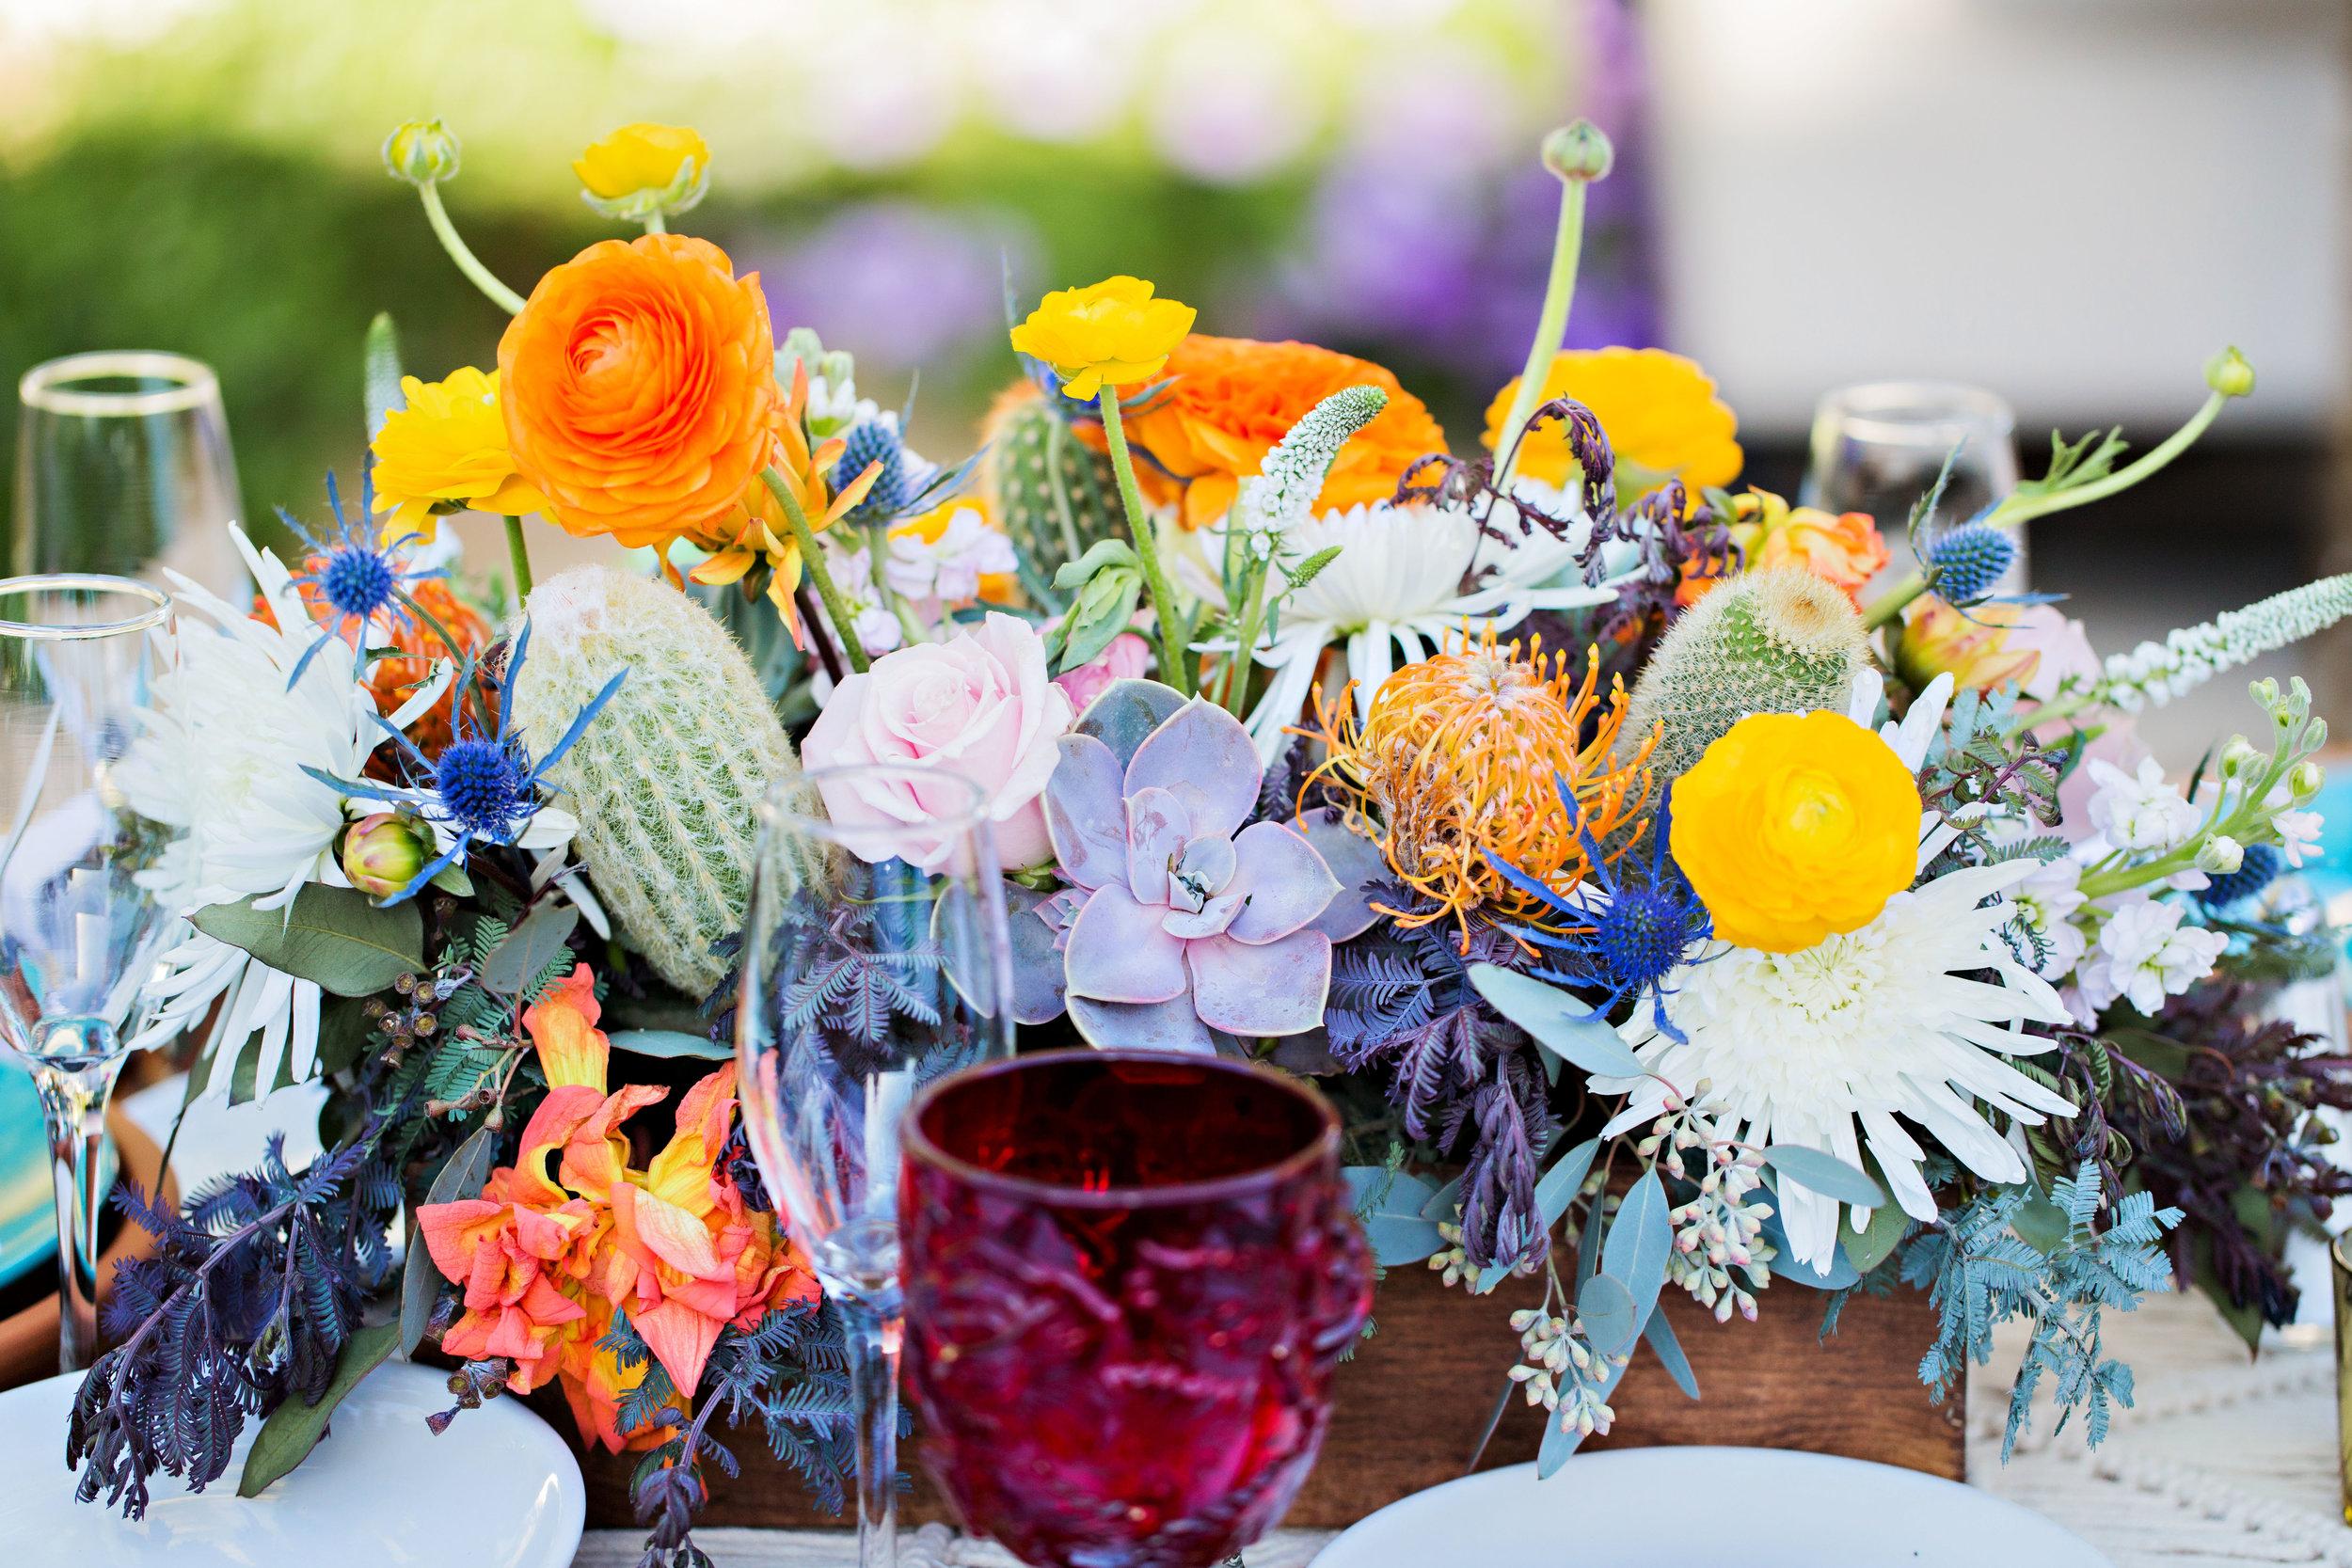 Fiesta Inspired Wedding Reception - El Chorro - Bright Centerpieces with ranunculus, mums, cactus, pincushion protea, acacia, veronica, and thistle